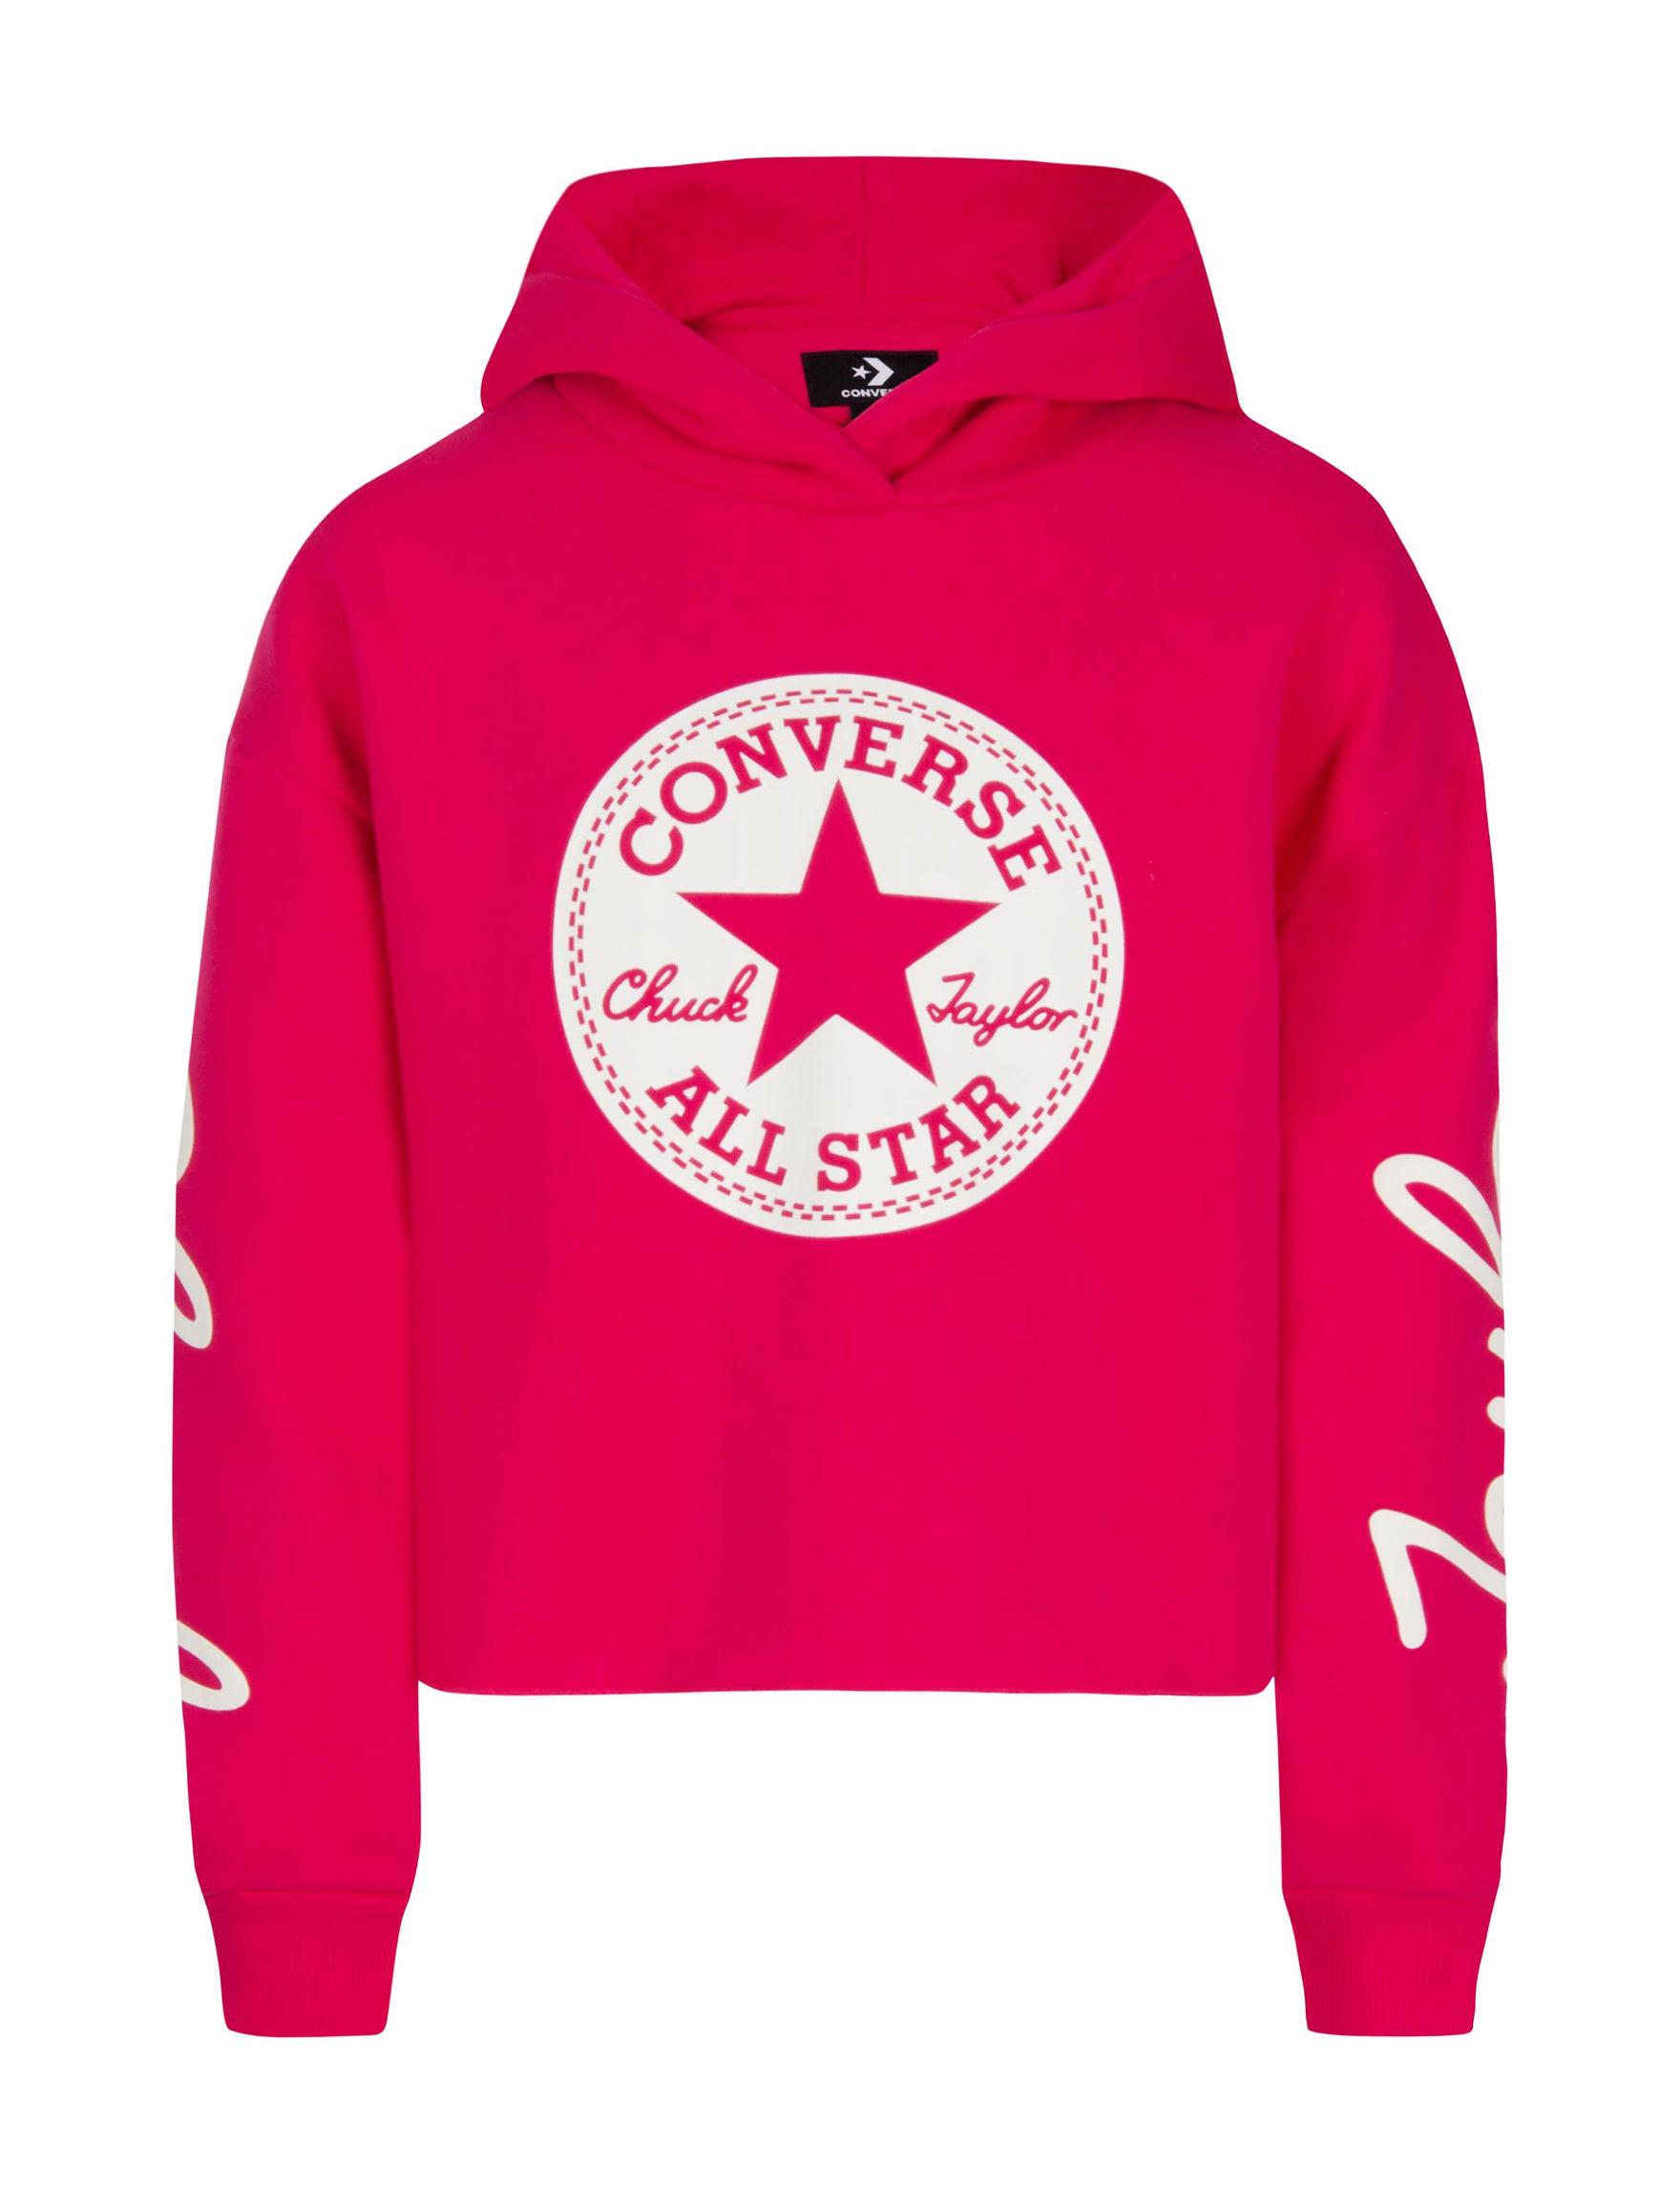 Converse Hot Pink